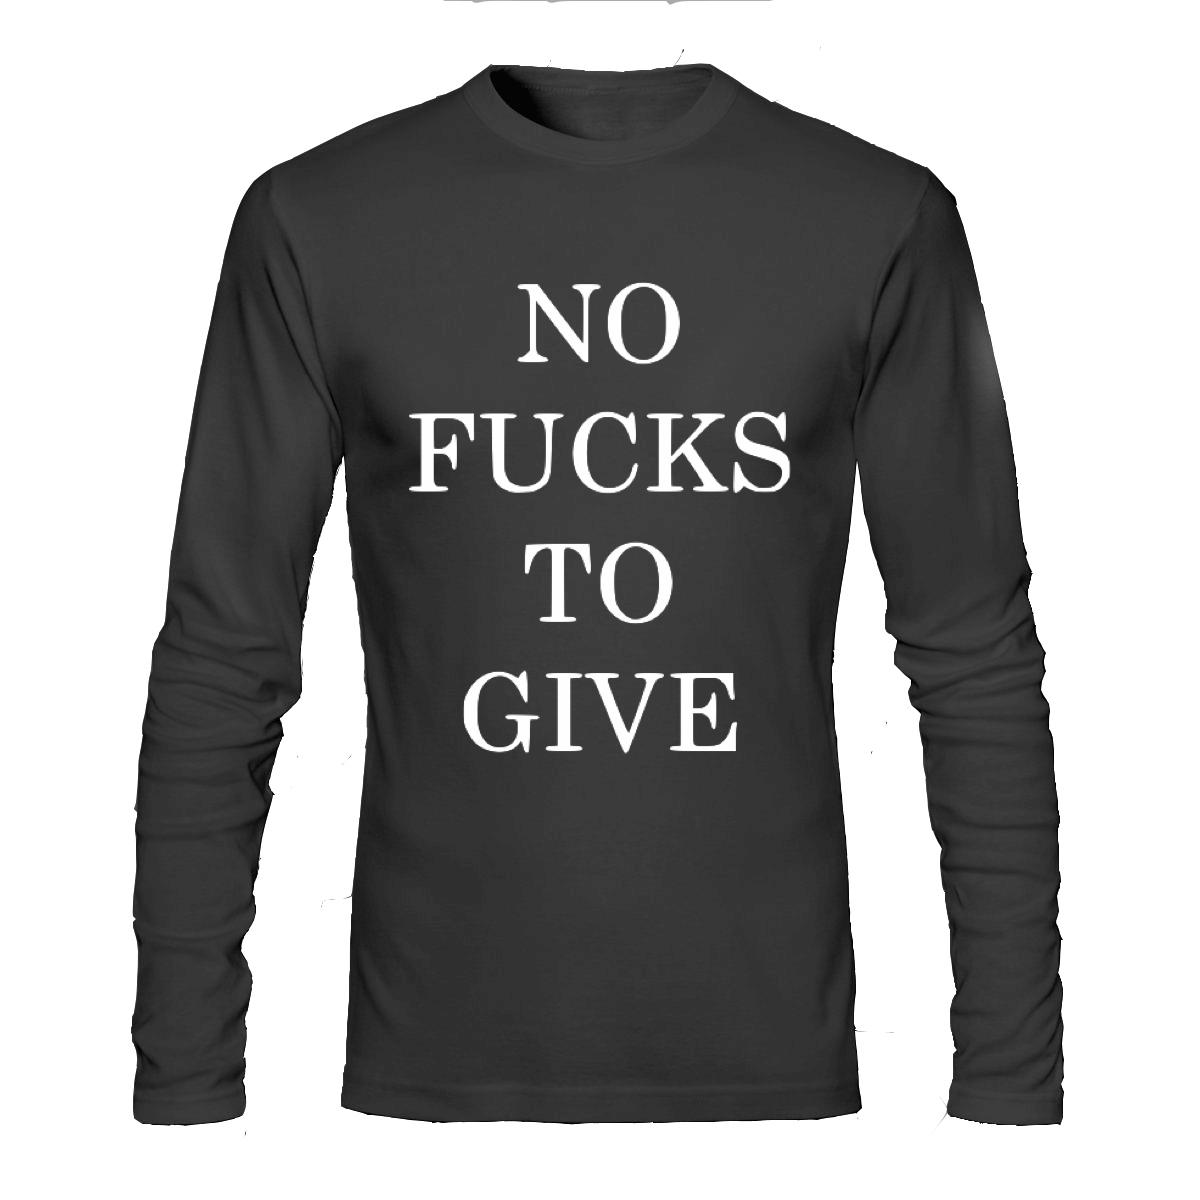 793feed5c No fucks to give full sleeve t-shirt | Swag Shirts